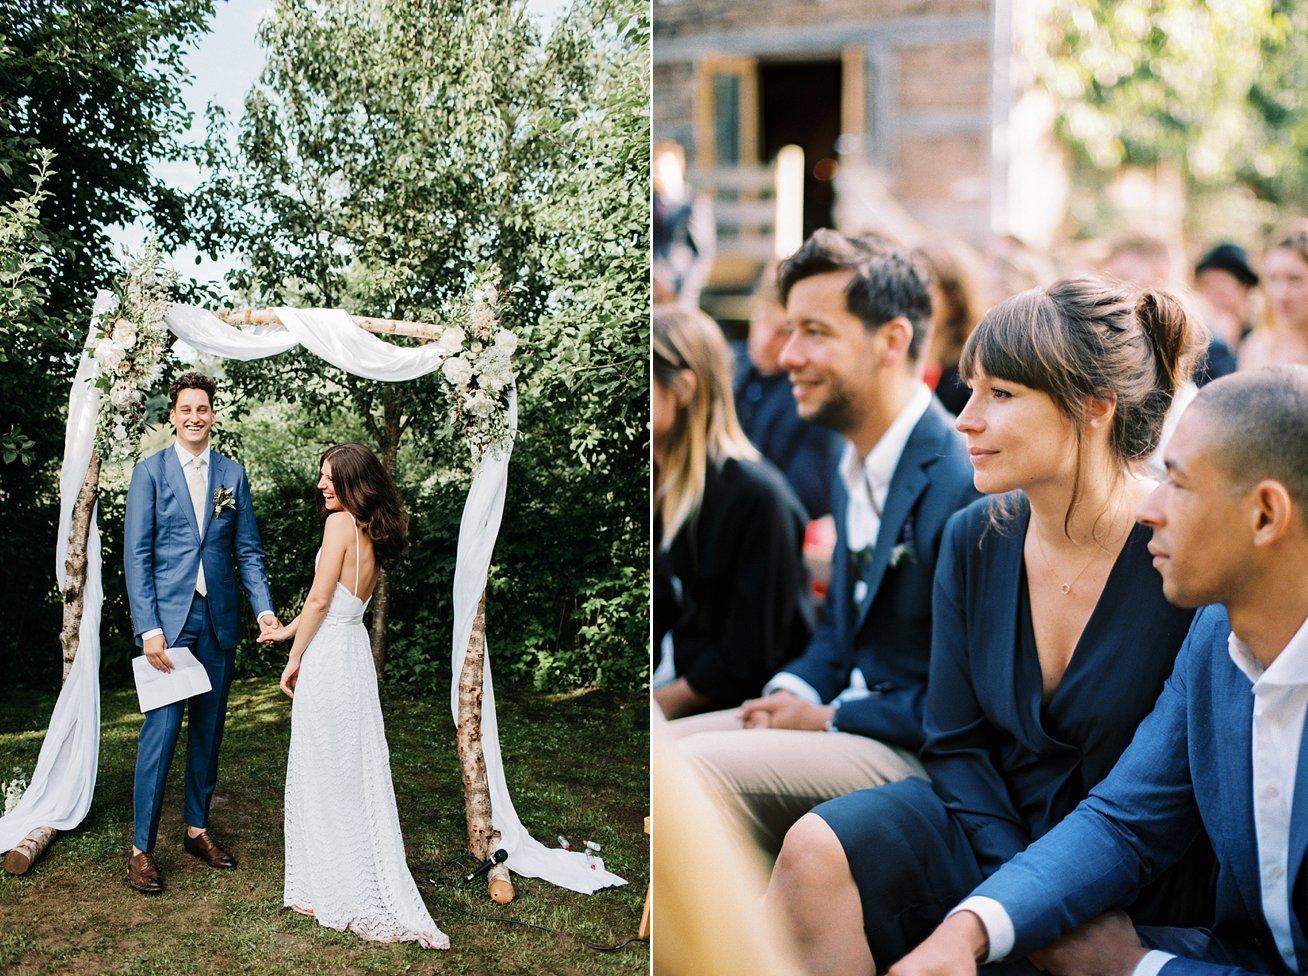 Amanda-Drost-photography-wedding-bruioft-zuid-limburg-hoeve-vernelsveld_0014.jpg